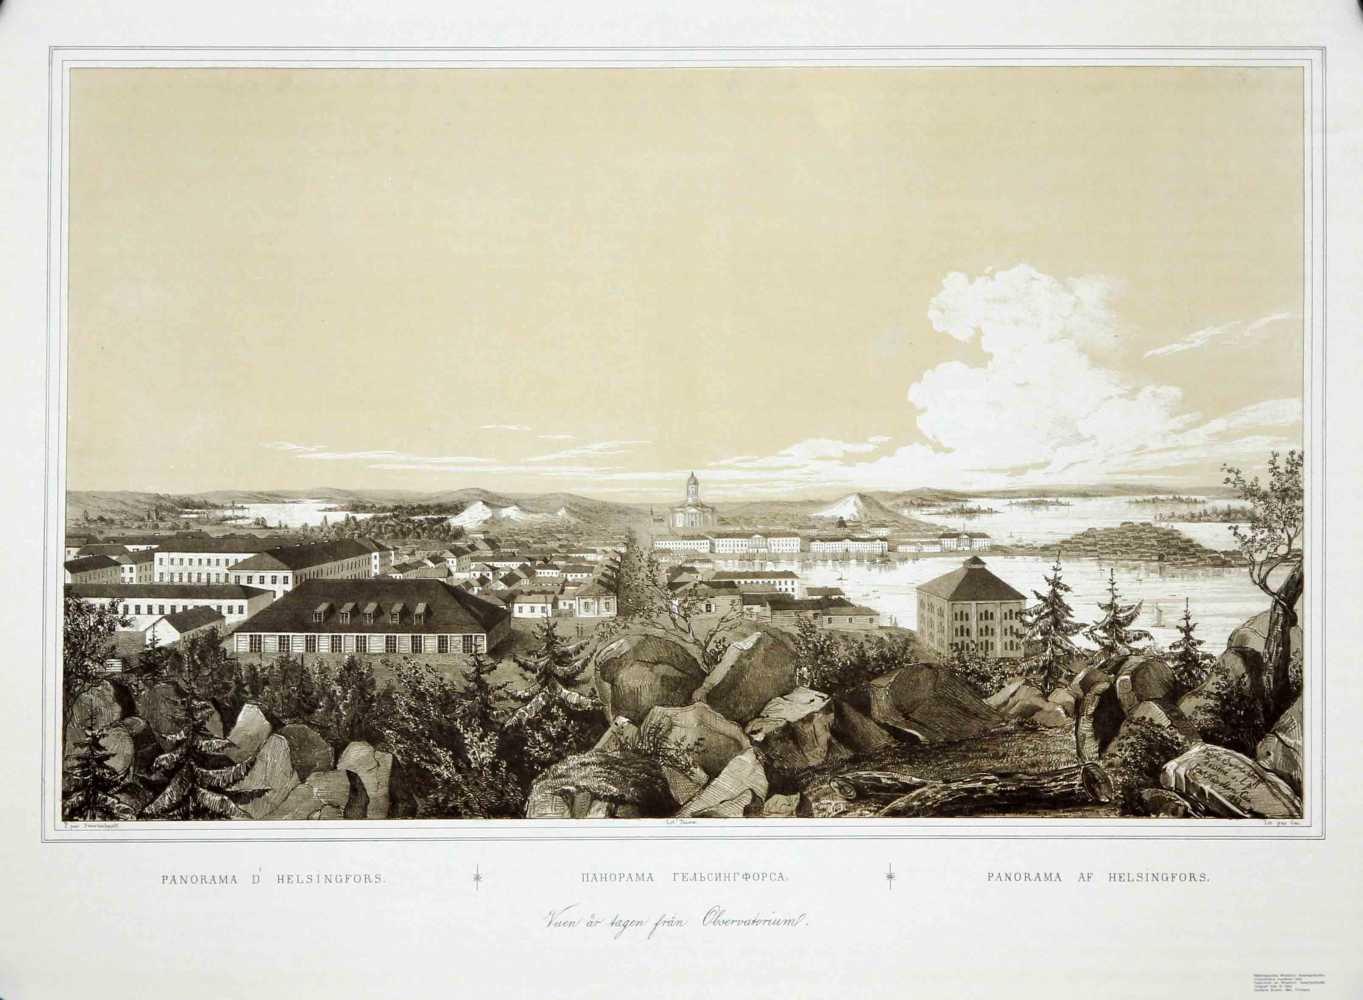 SWERTSCHKOFF, W. Panorama d'Helsingfors. Панорама Гельсингфорса. Panorama af Helsingfors